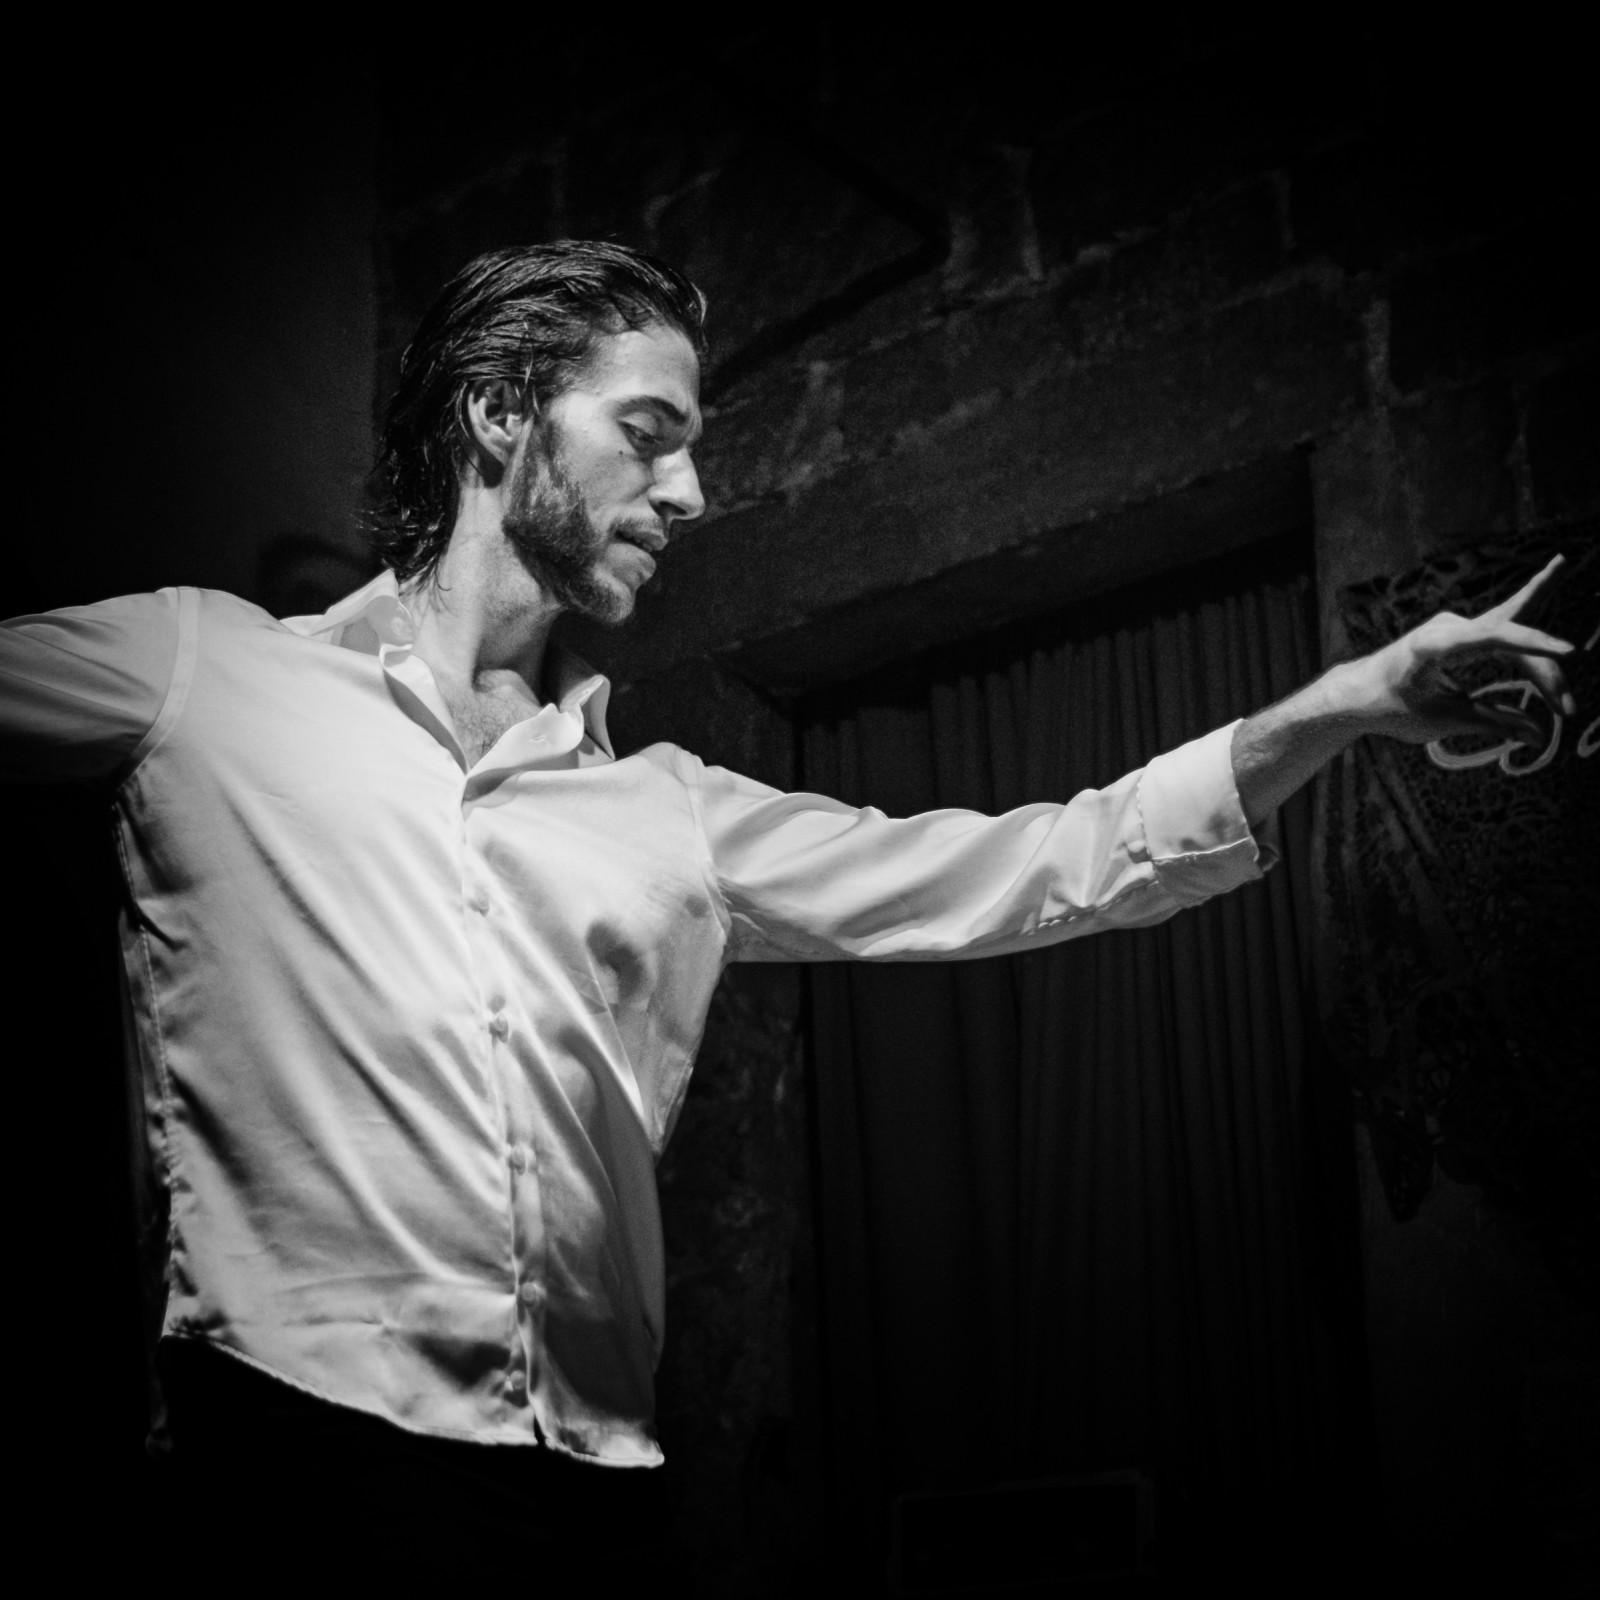 Flamenco male dancer Barcelona Spain